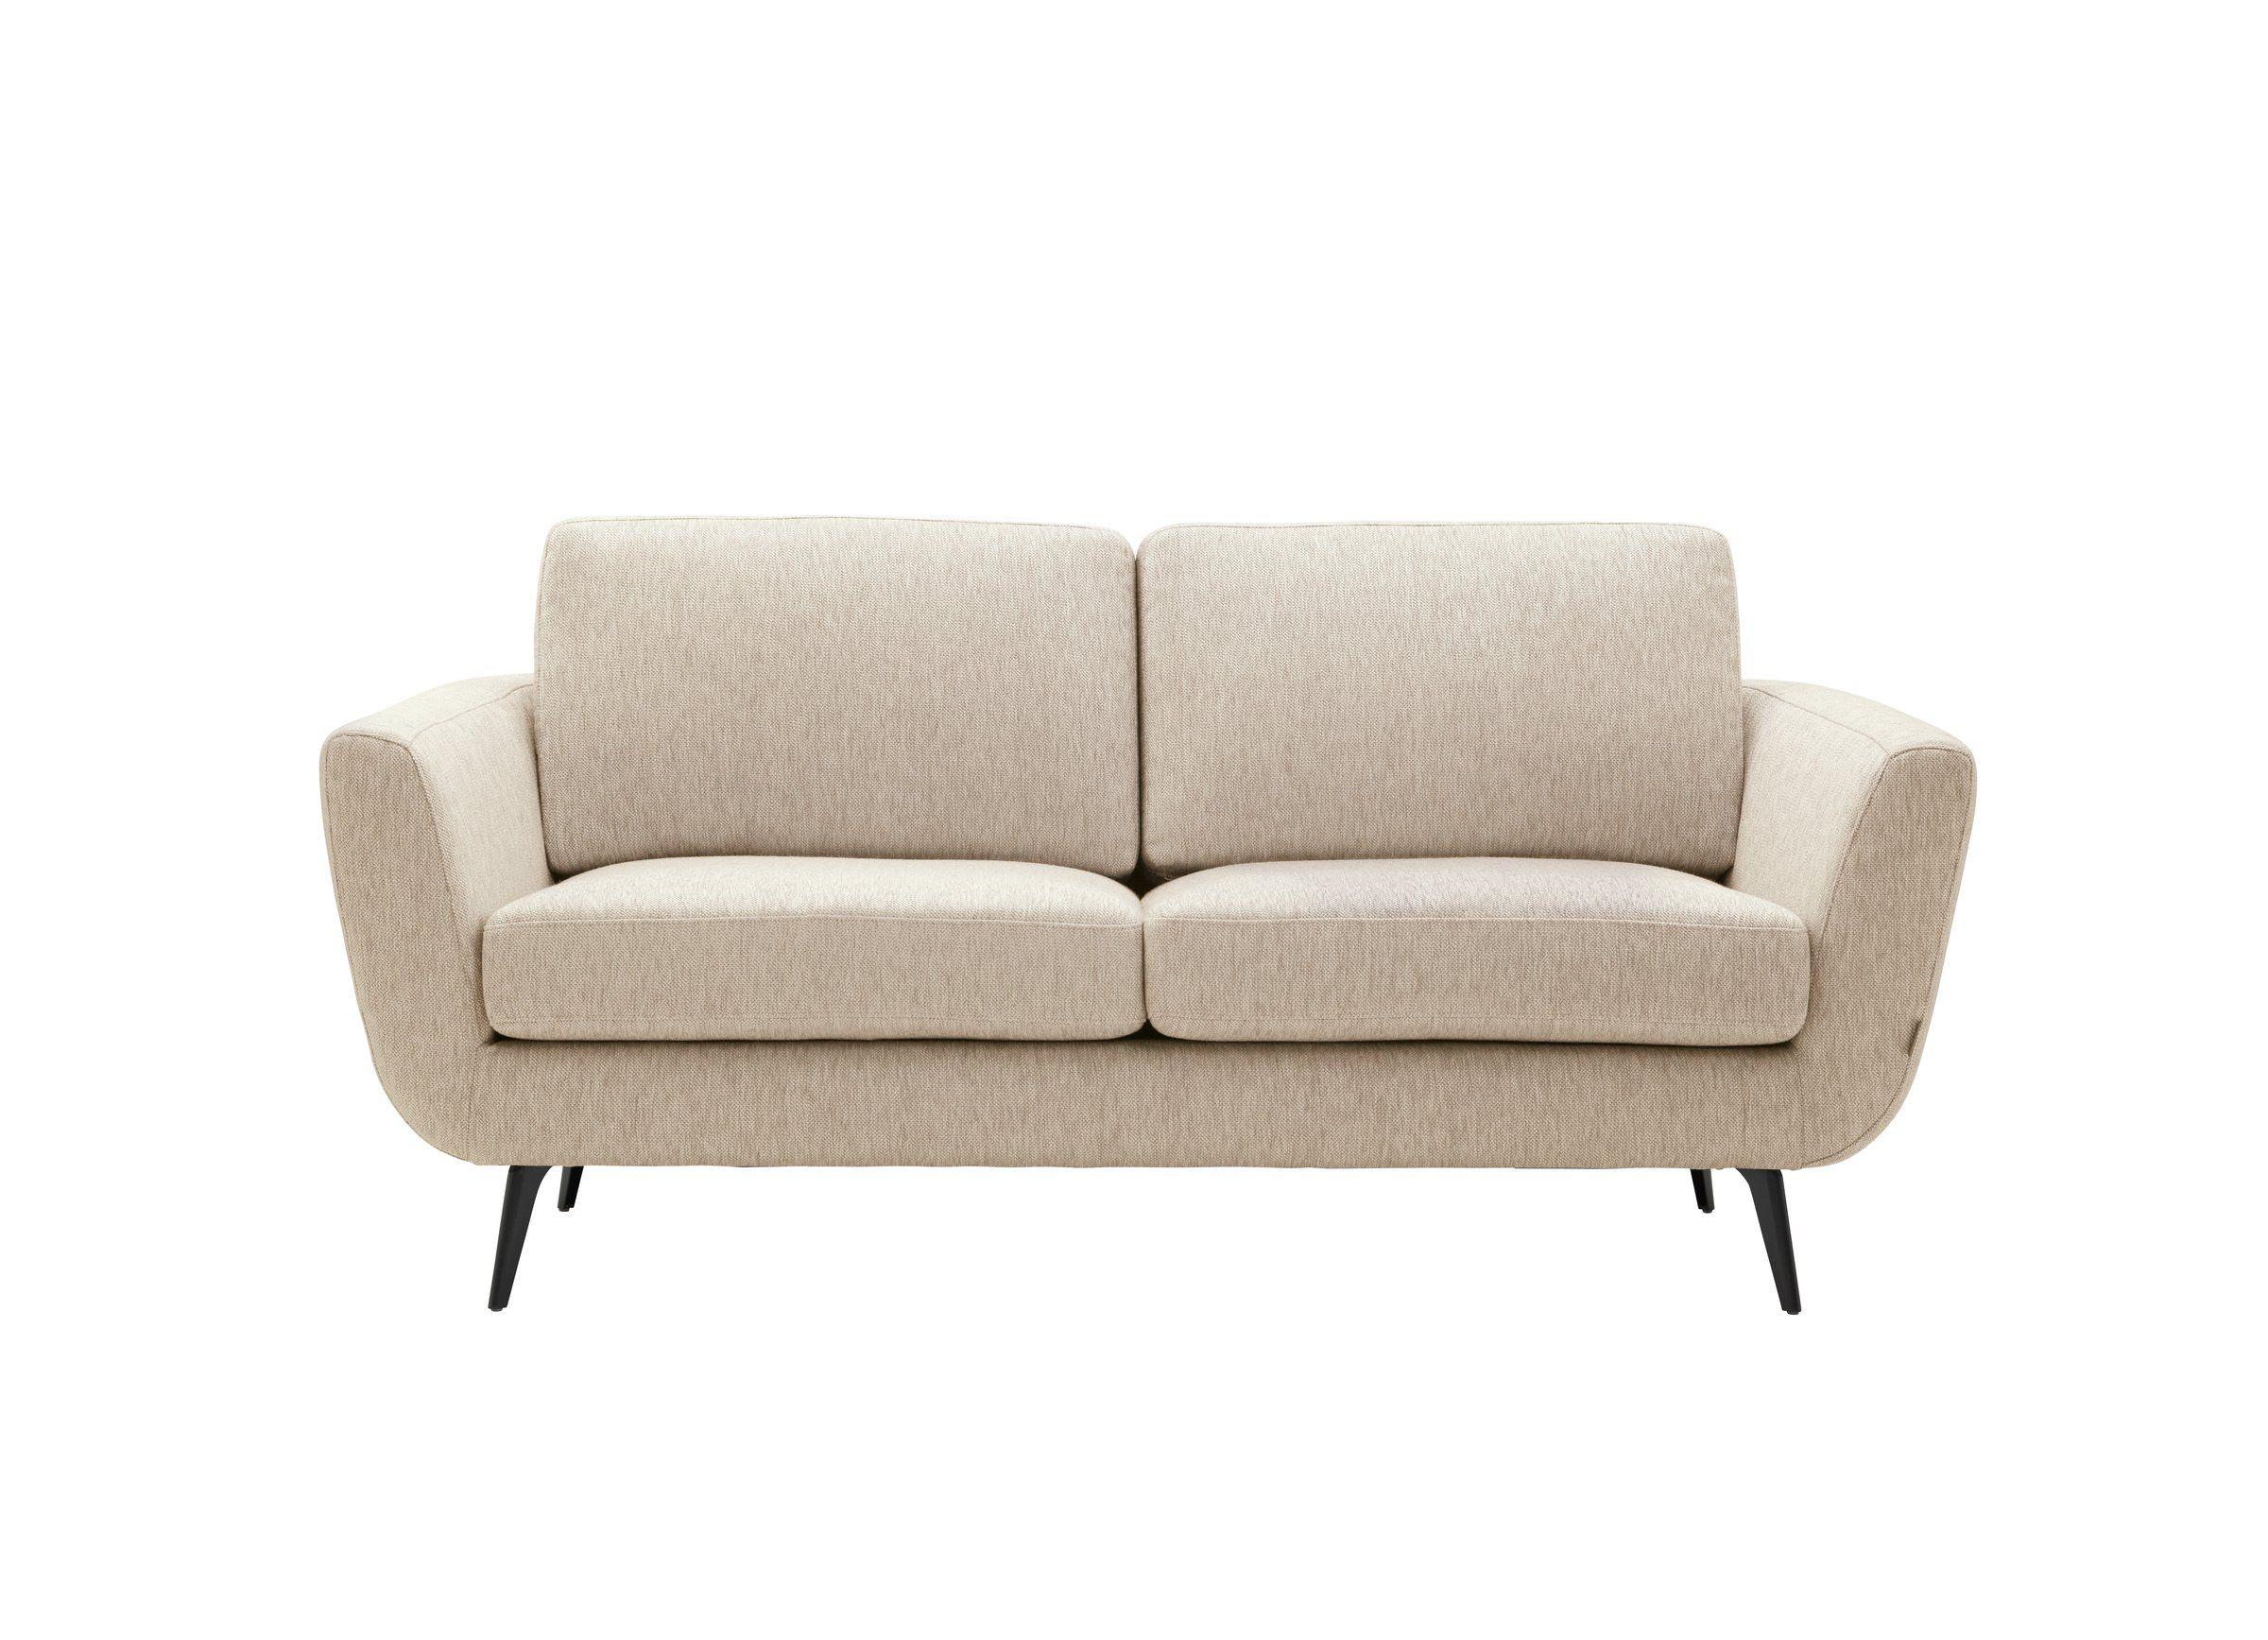 seidel diverse farben und materialien z b stoff zanas 45 viskose 39 polyester. Black Bedroom Furniture Sets. Home Design Ideas